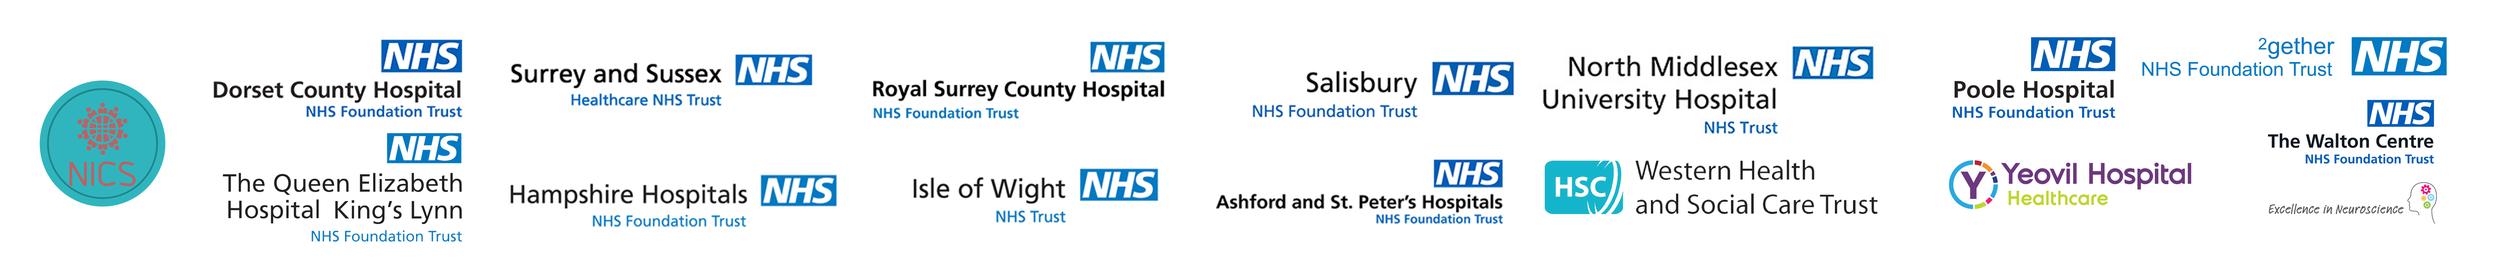 NHS_logos.png